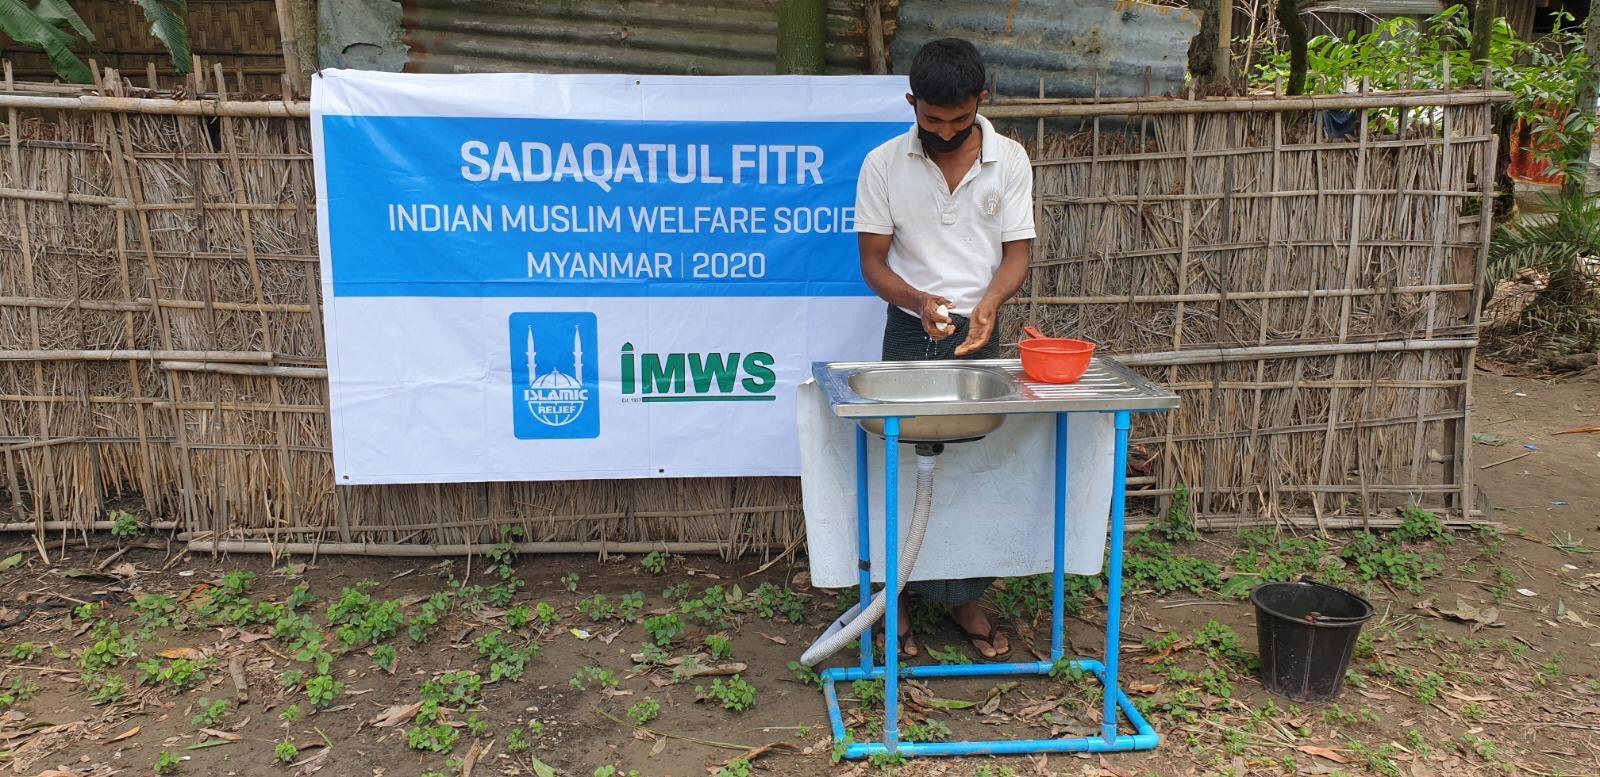 IMWS raise £100K in Ramadan and Sadqatul Fitr appeals